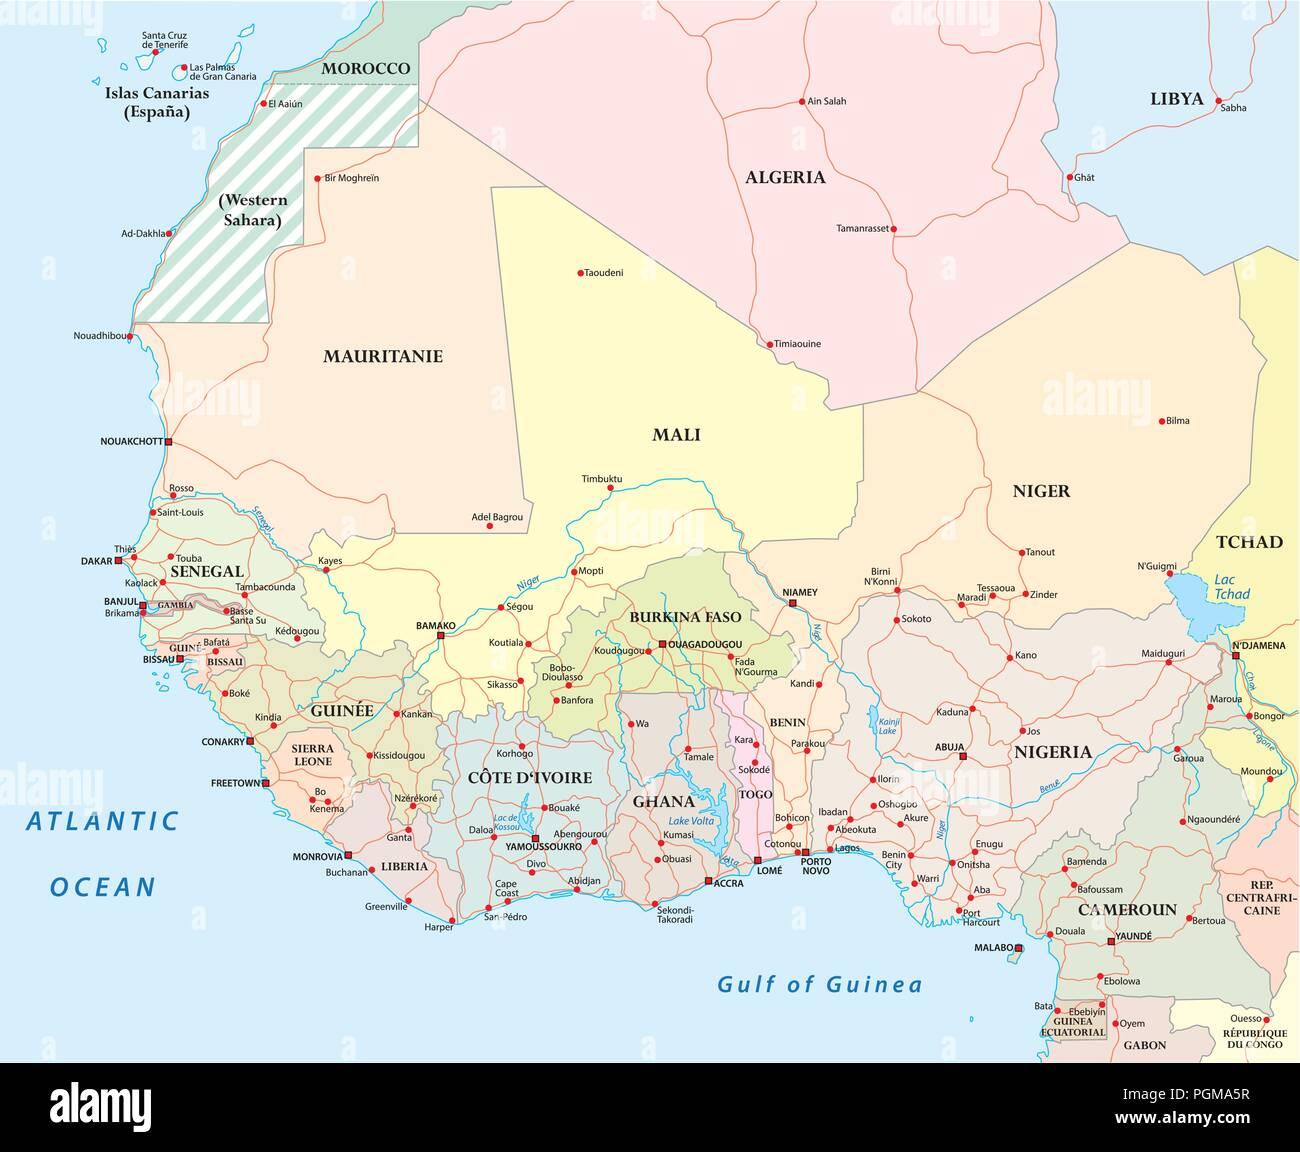 Africa Occidentale Cartina.Cartina Stradale Dettagliata Dei Paesi Dell Africa